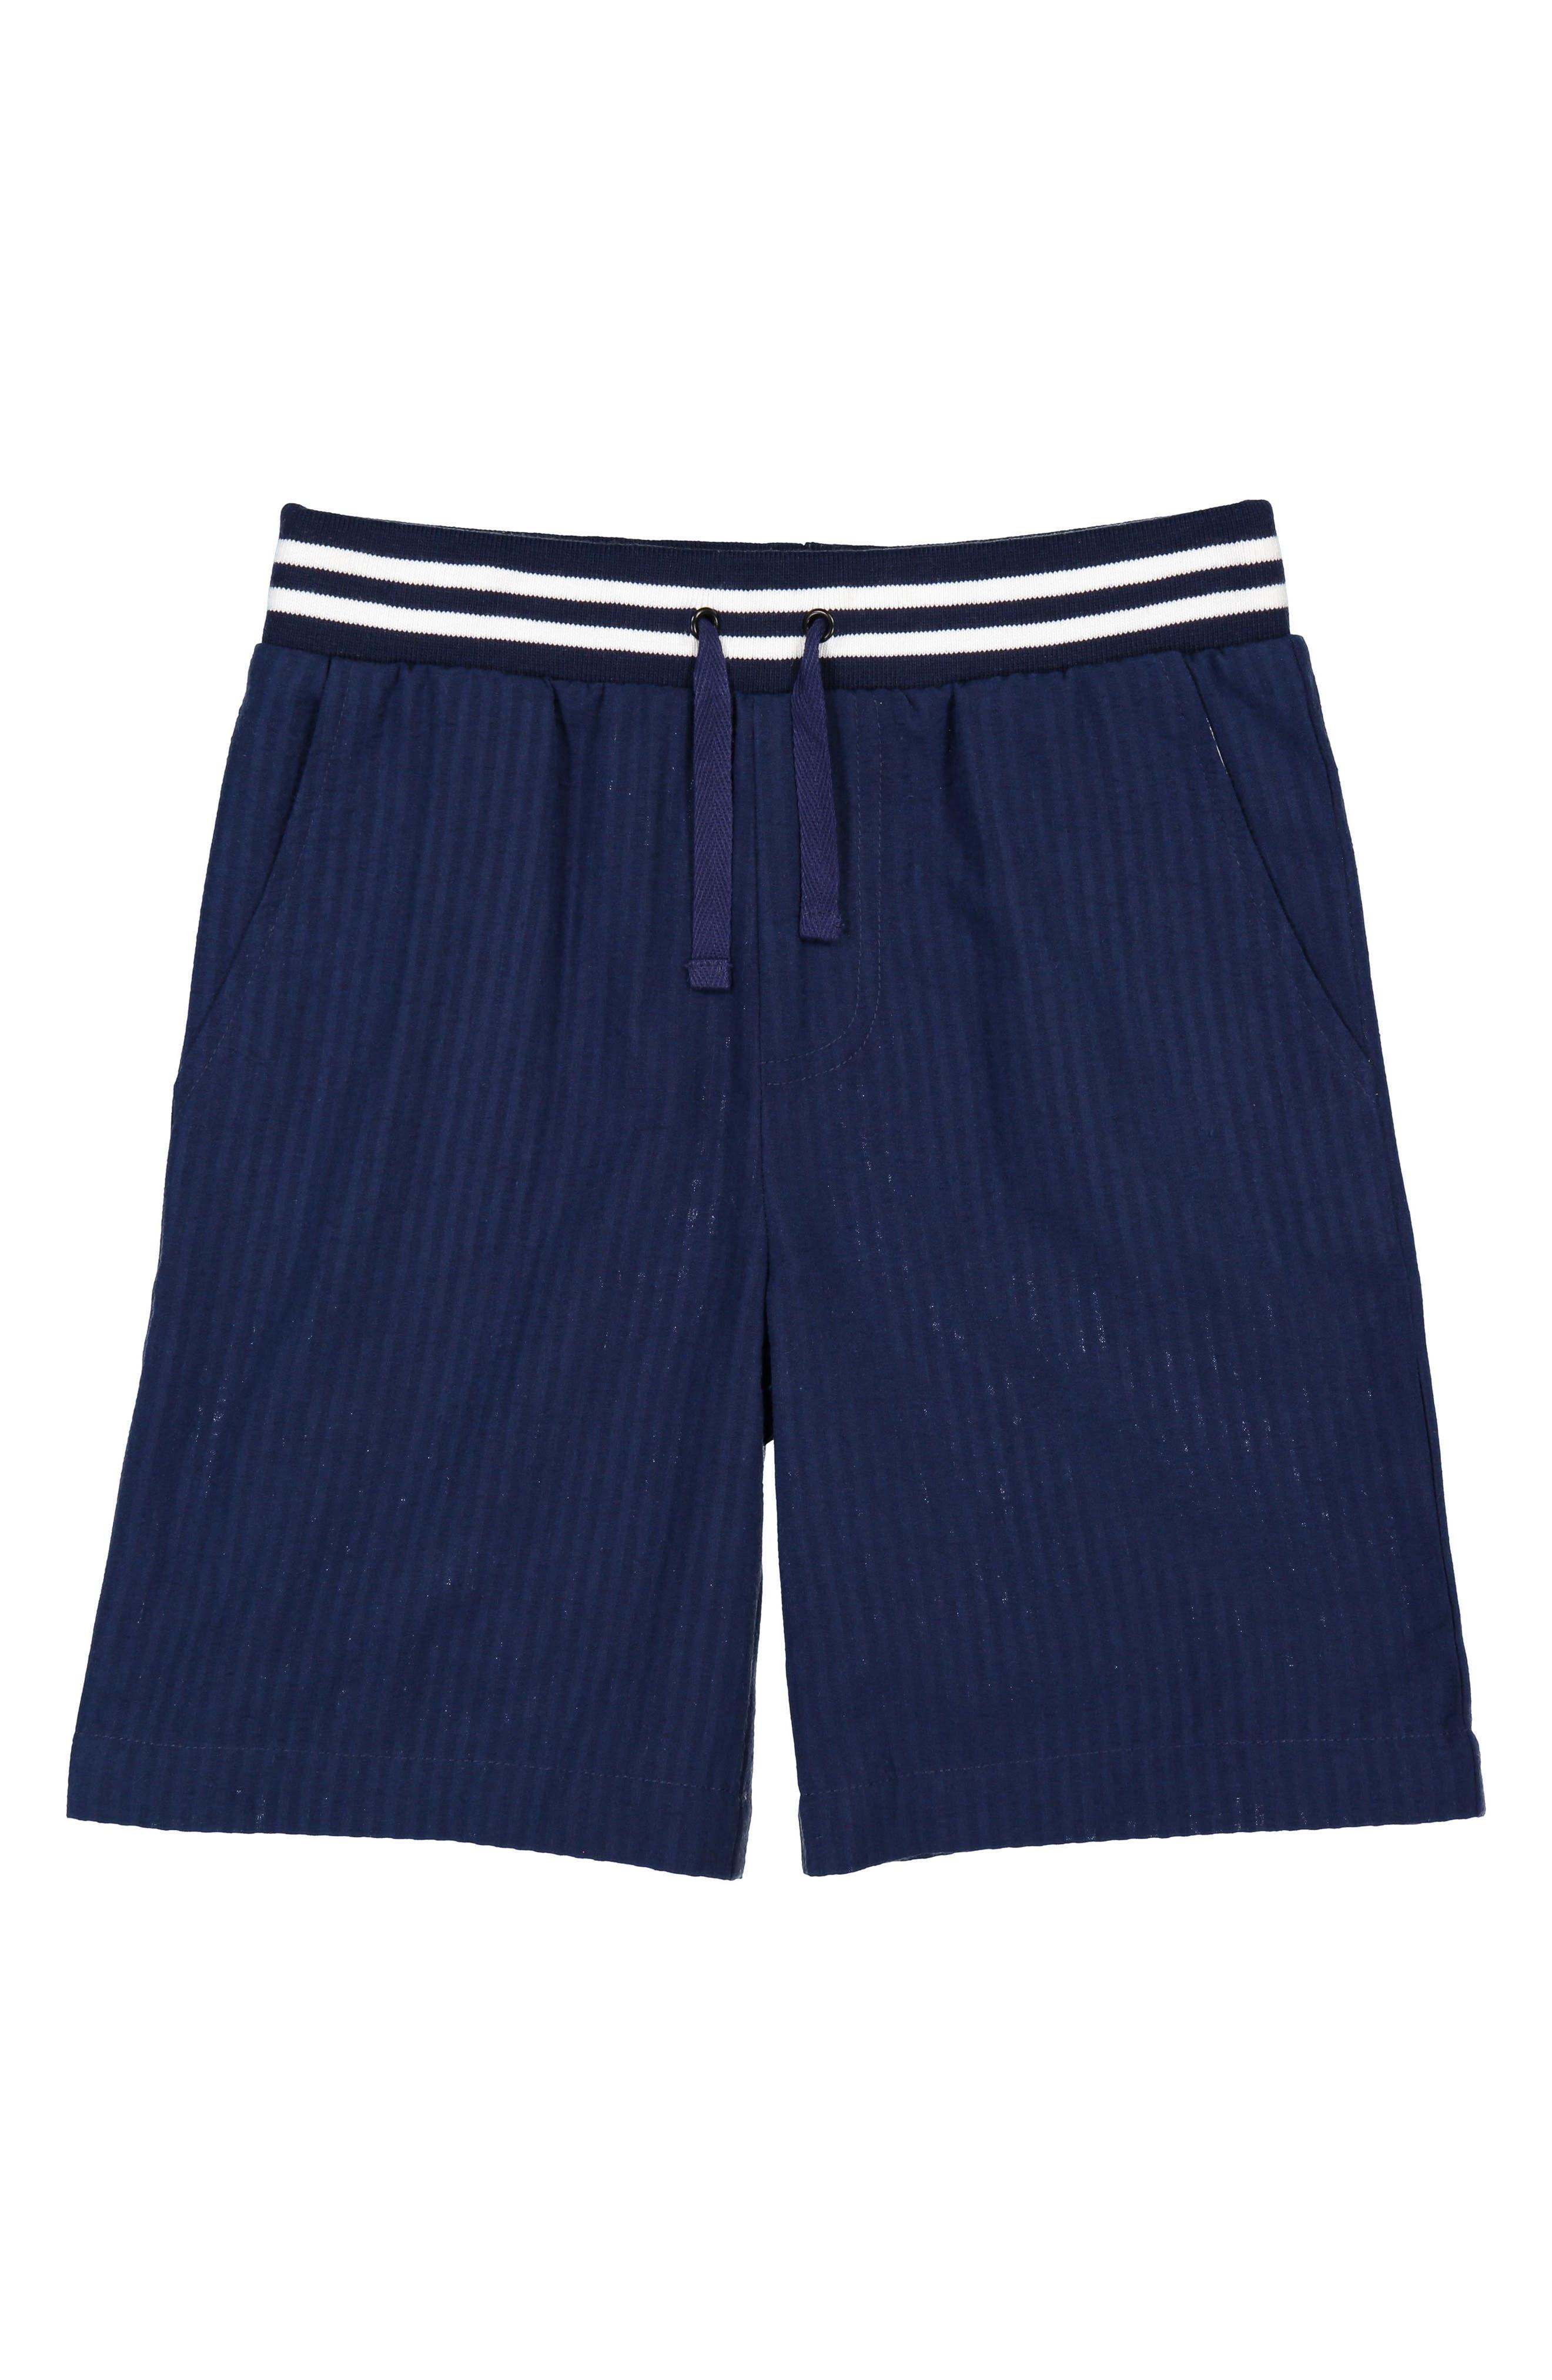 Andy & Evan Seersucker Jogger Shorts (Toddler Boys & Little Boys)